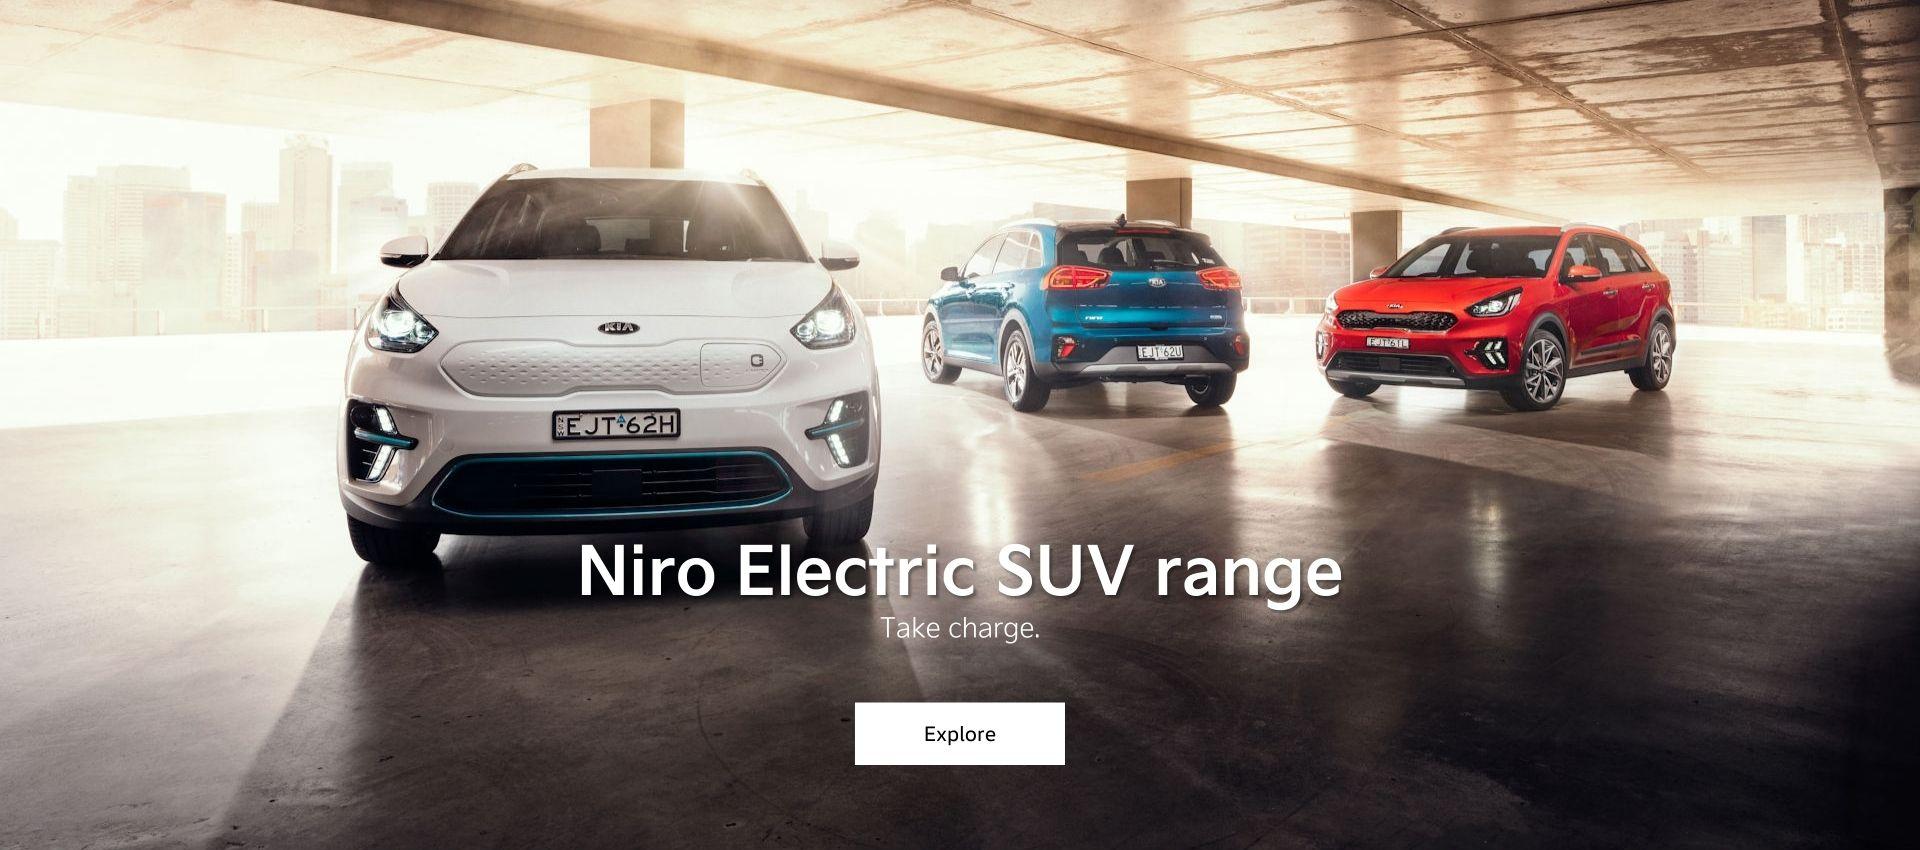 Niro Electric SUV range